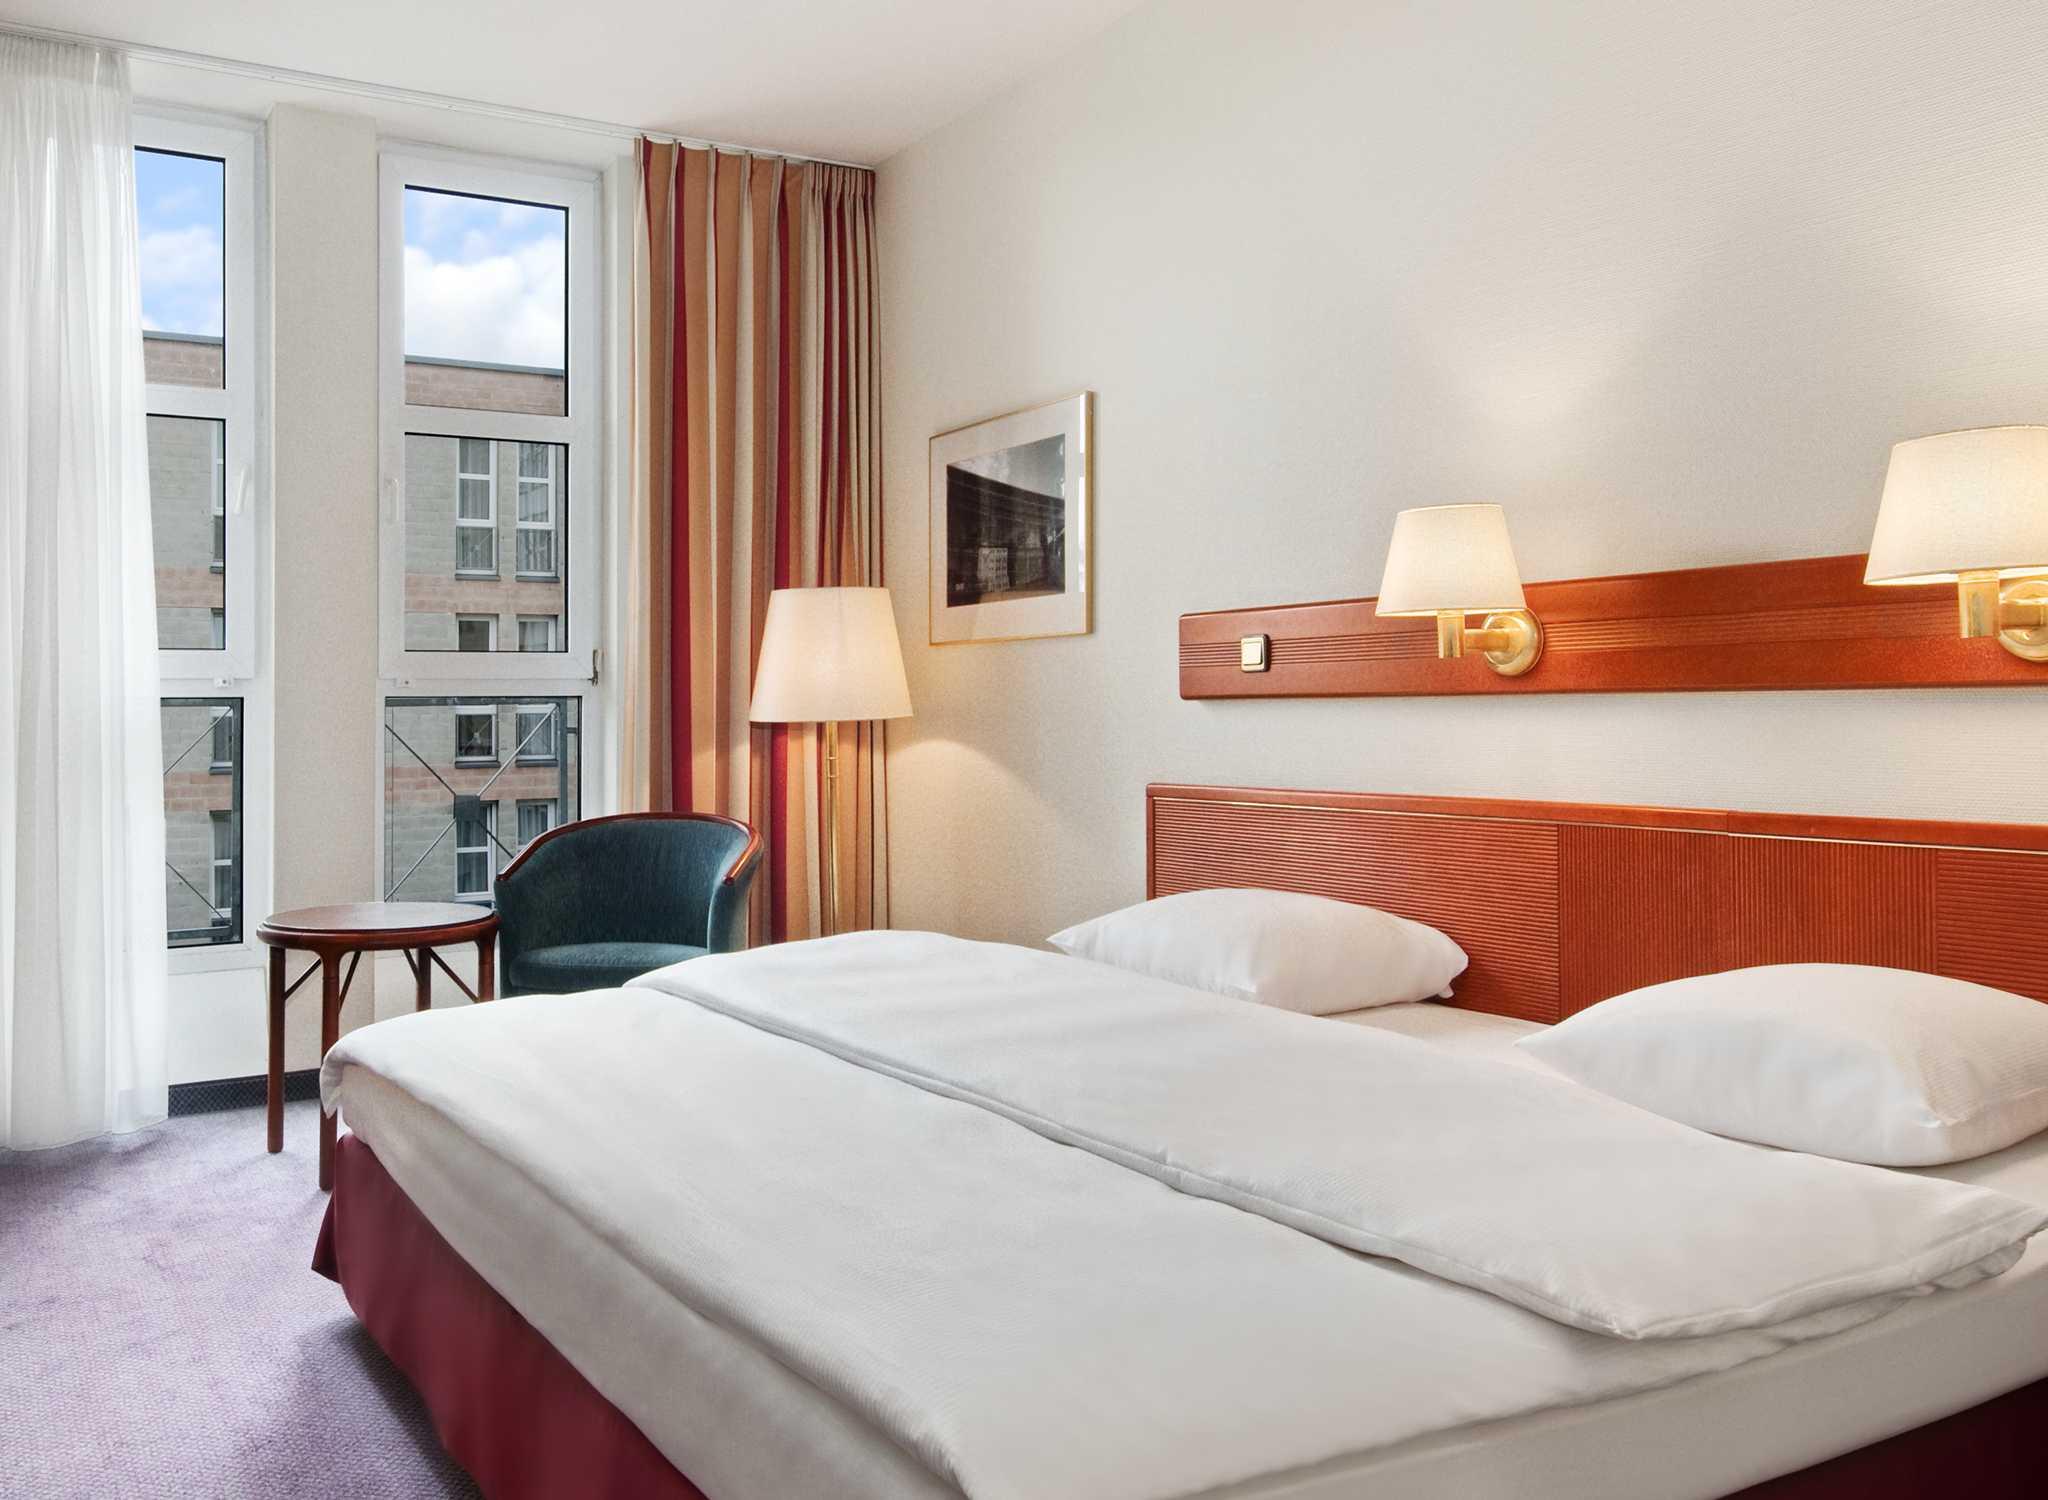 Hilton nuremberg hotel hotel n rnberg am lorenzer wald for Nurnberg hotel